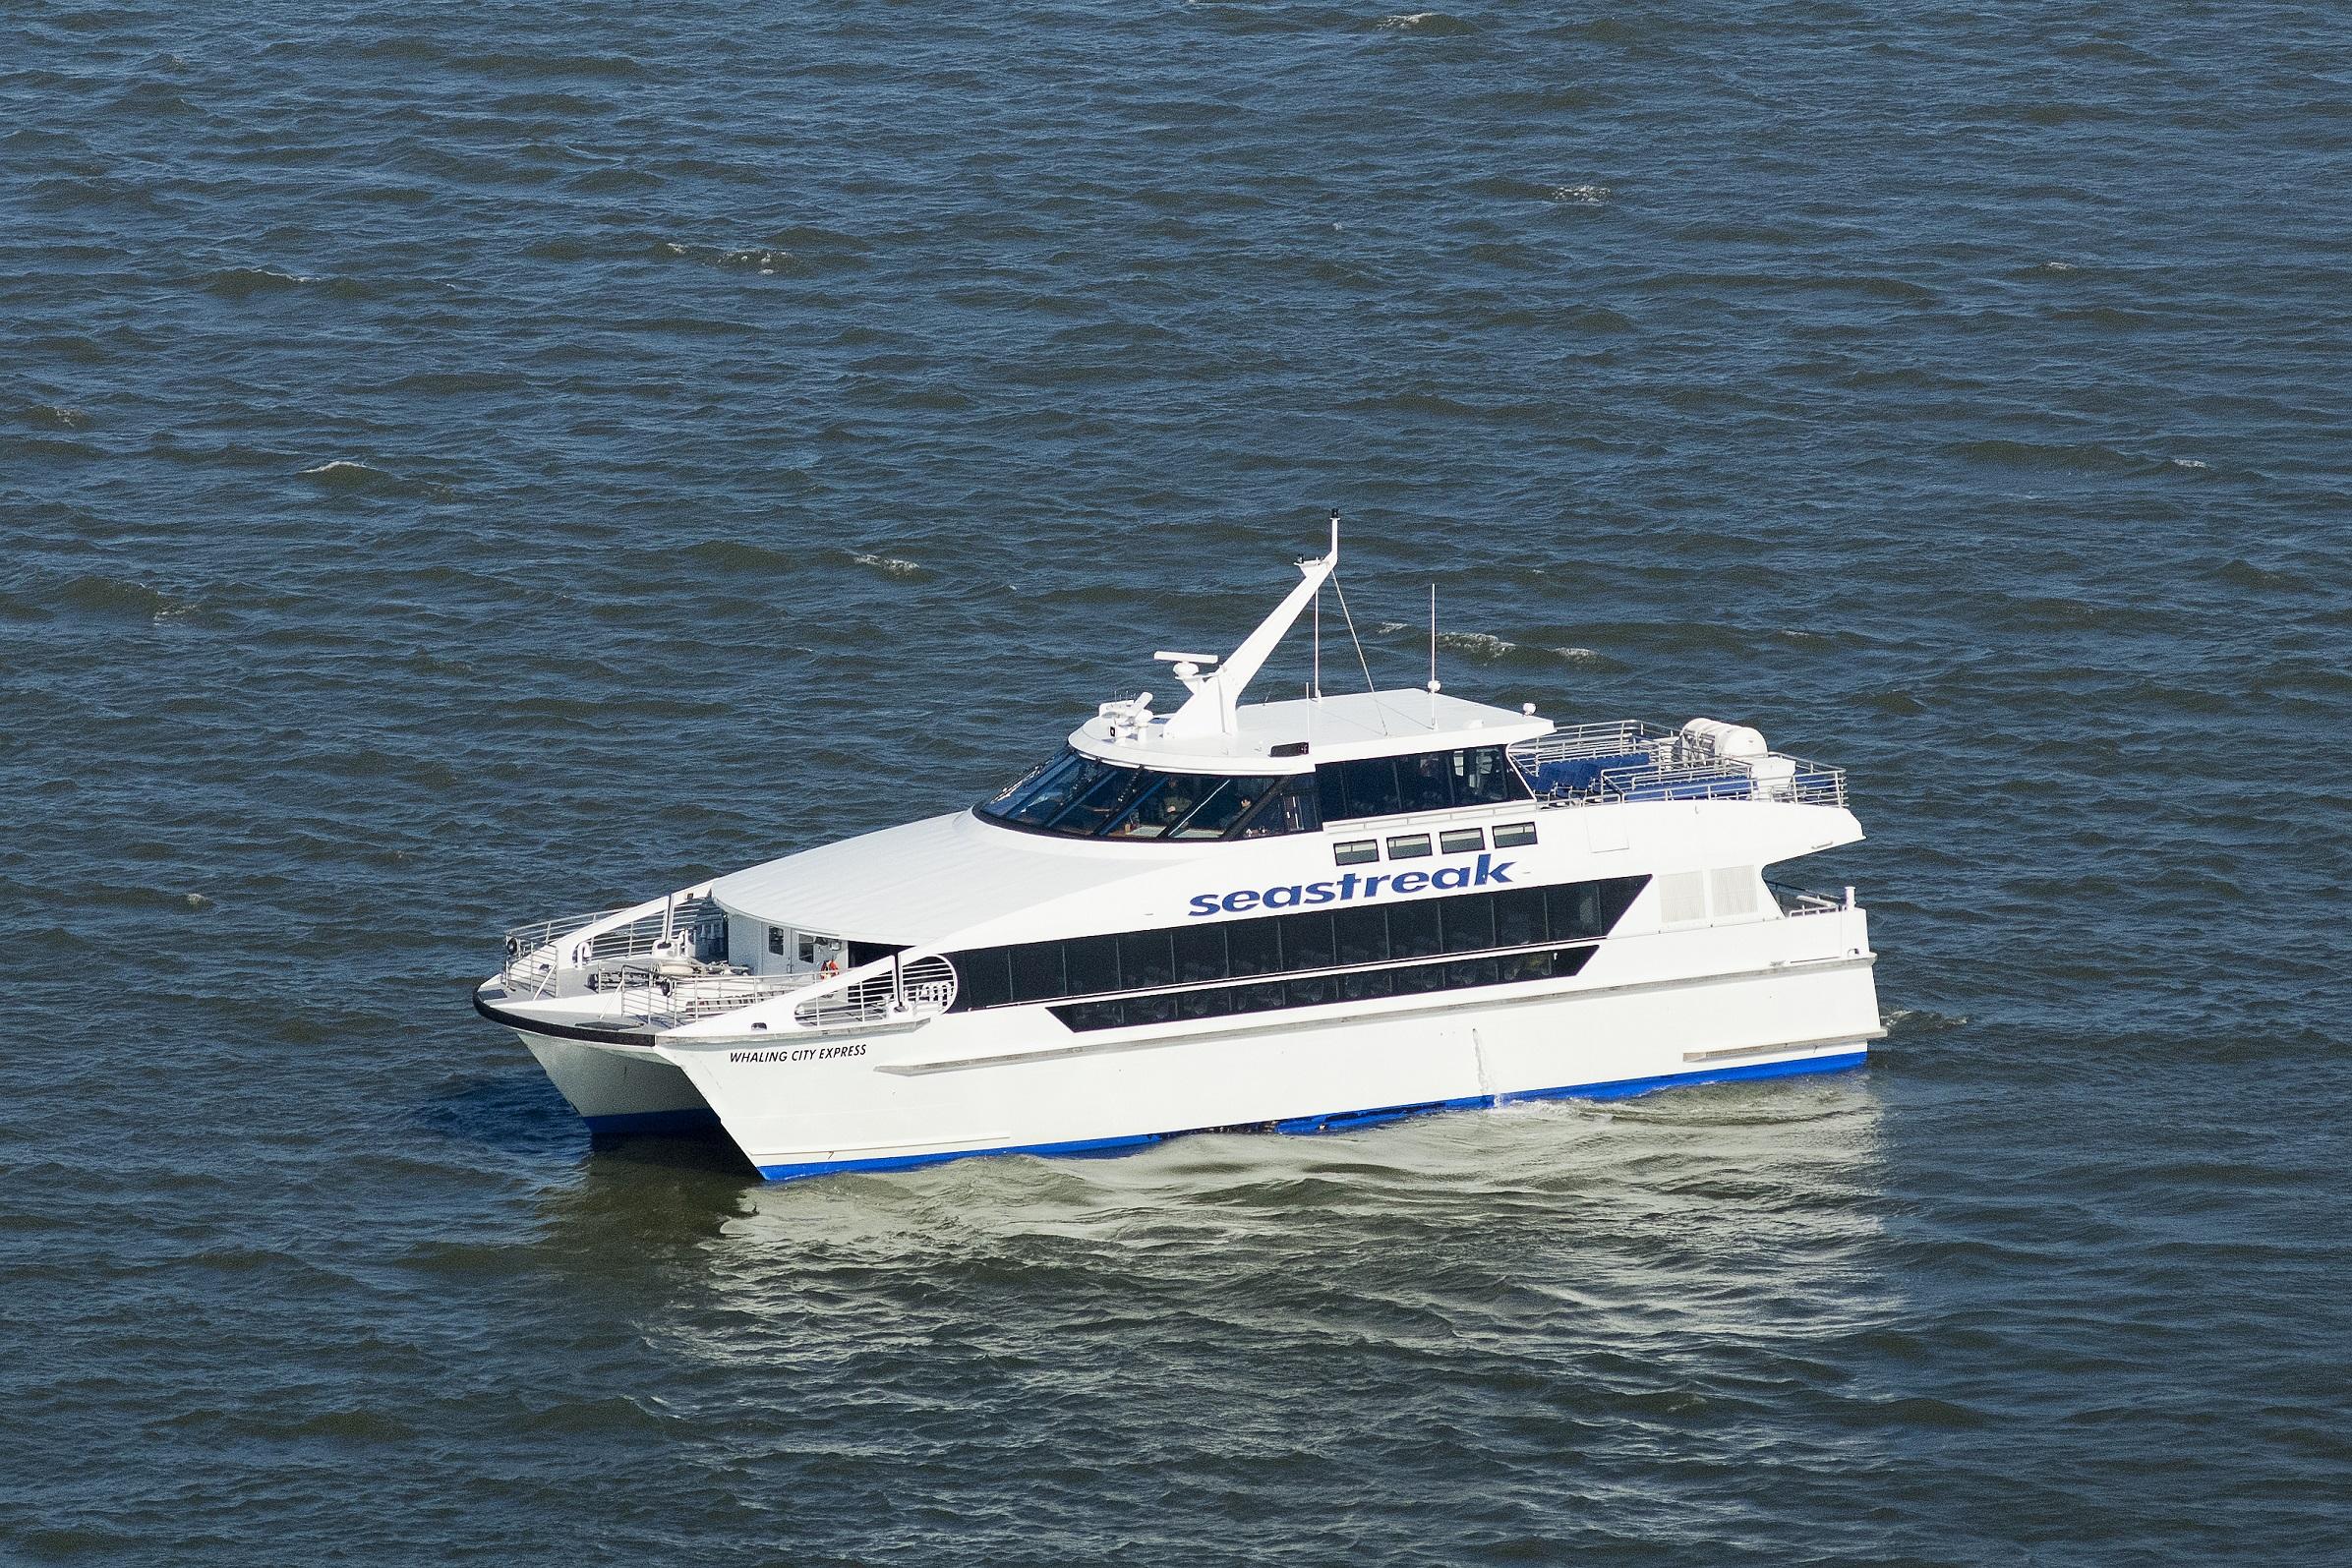 seastreak to operate seasonal ferry service between new bedford and